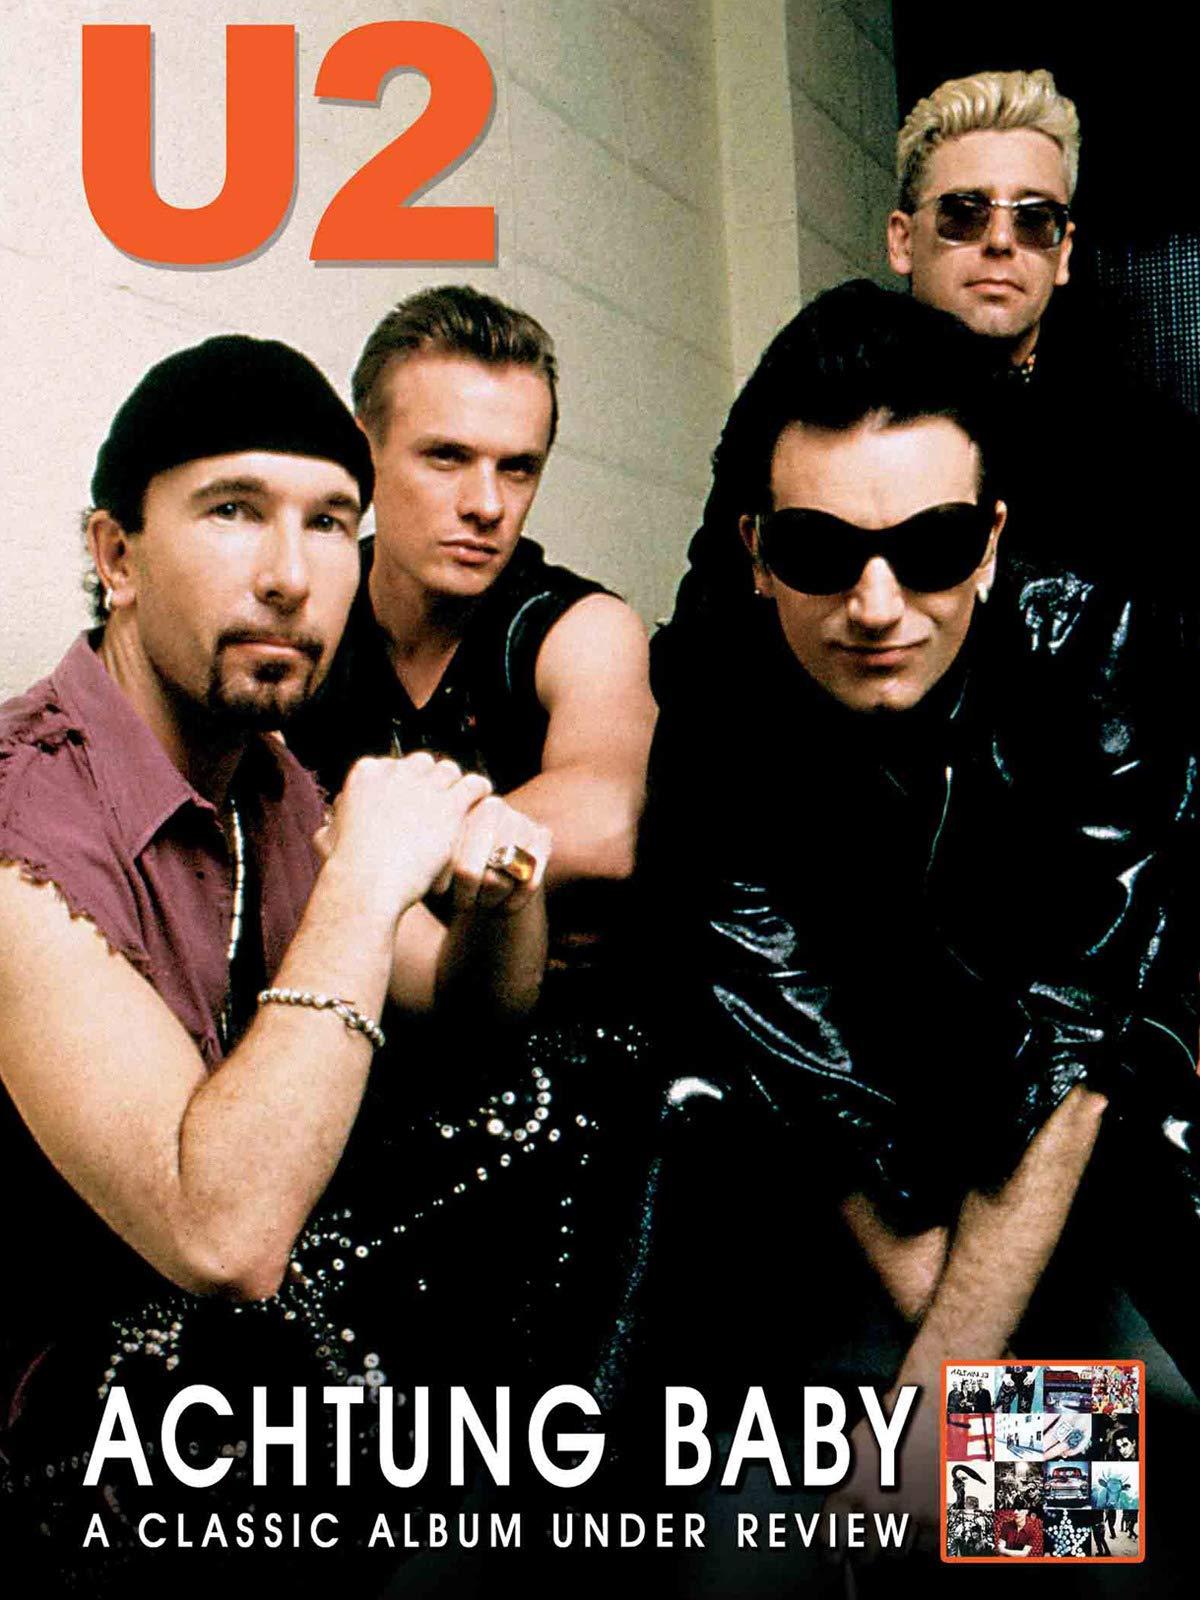 U2 - Achtung Baby: Classic Album Under Review